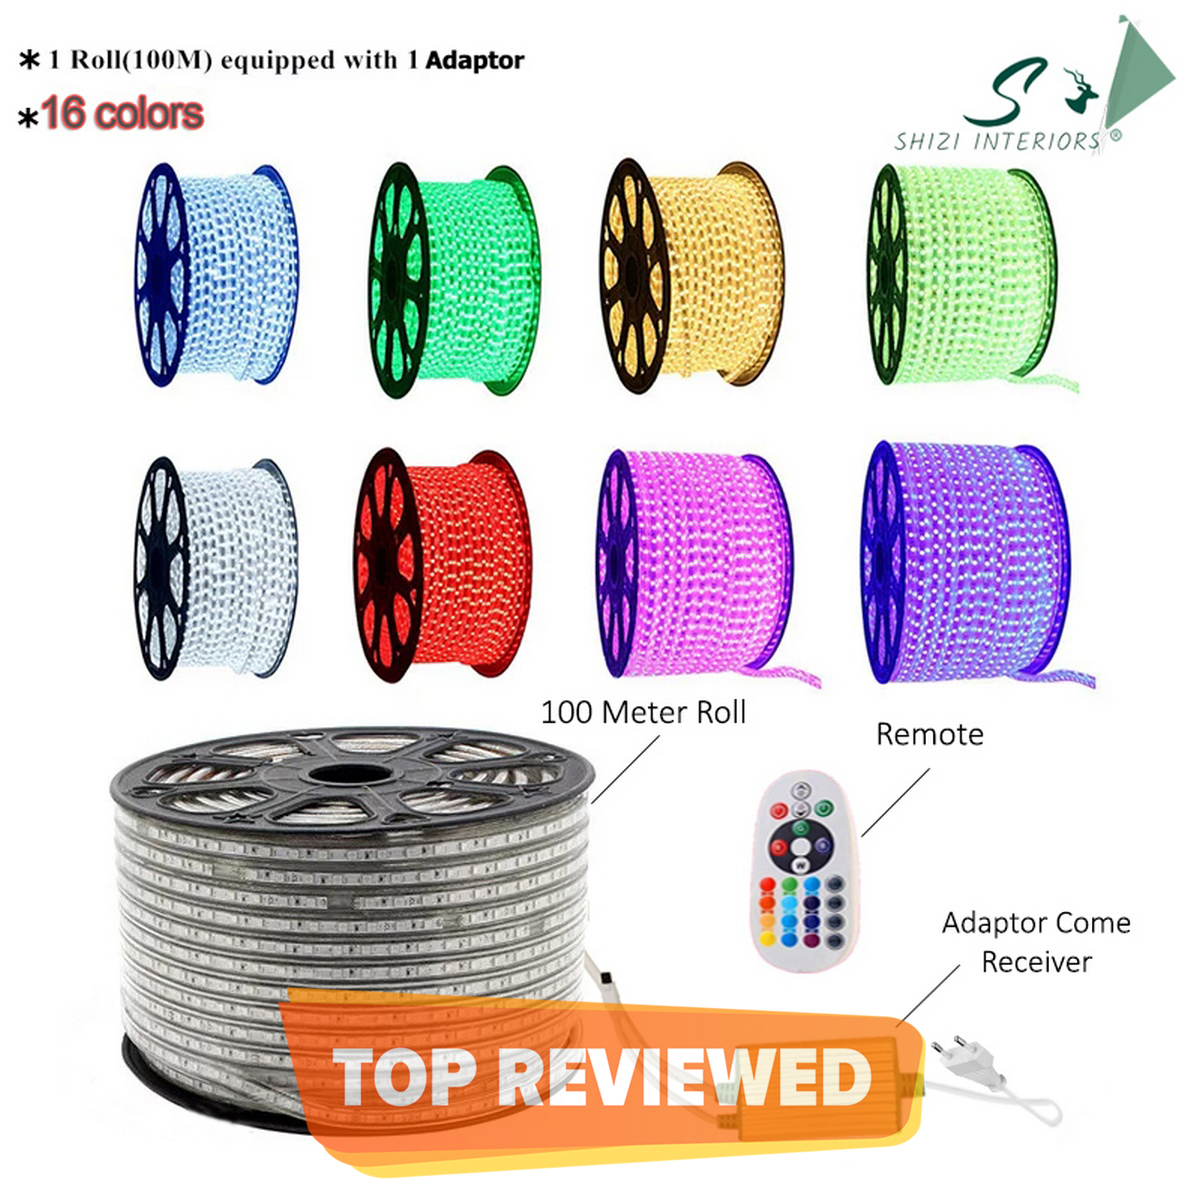 Shizi 15 Meter to 100 Meter - LED Strip Light Color Changing Remote Control Rgb 5050 Model - 16 Color LED Strip with Adapter and Remote - 15 Meter/20 Meter/50 Meter /100 Meter